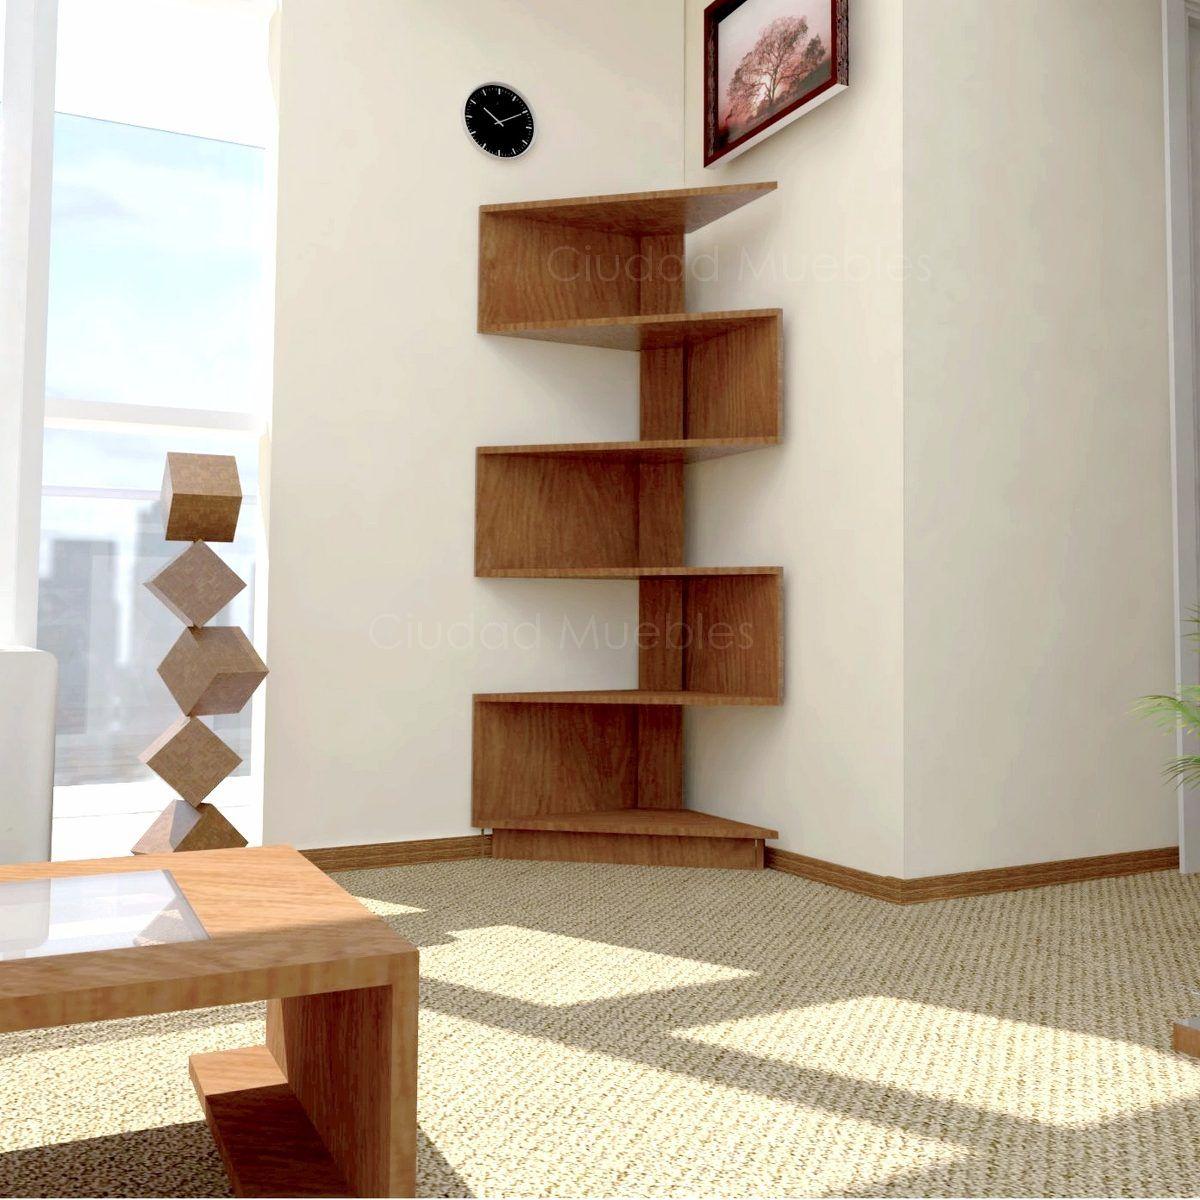 Modular rack esquinero moderno dise o minimalista for Diseno de muebles de madera modernos